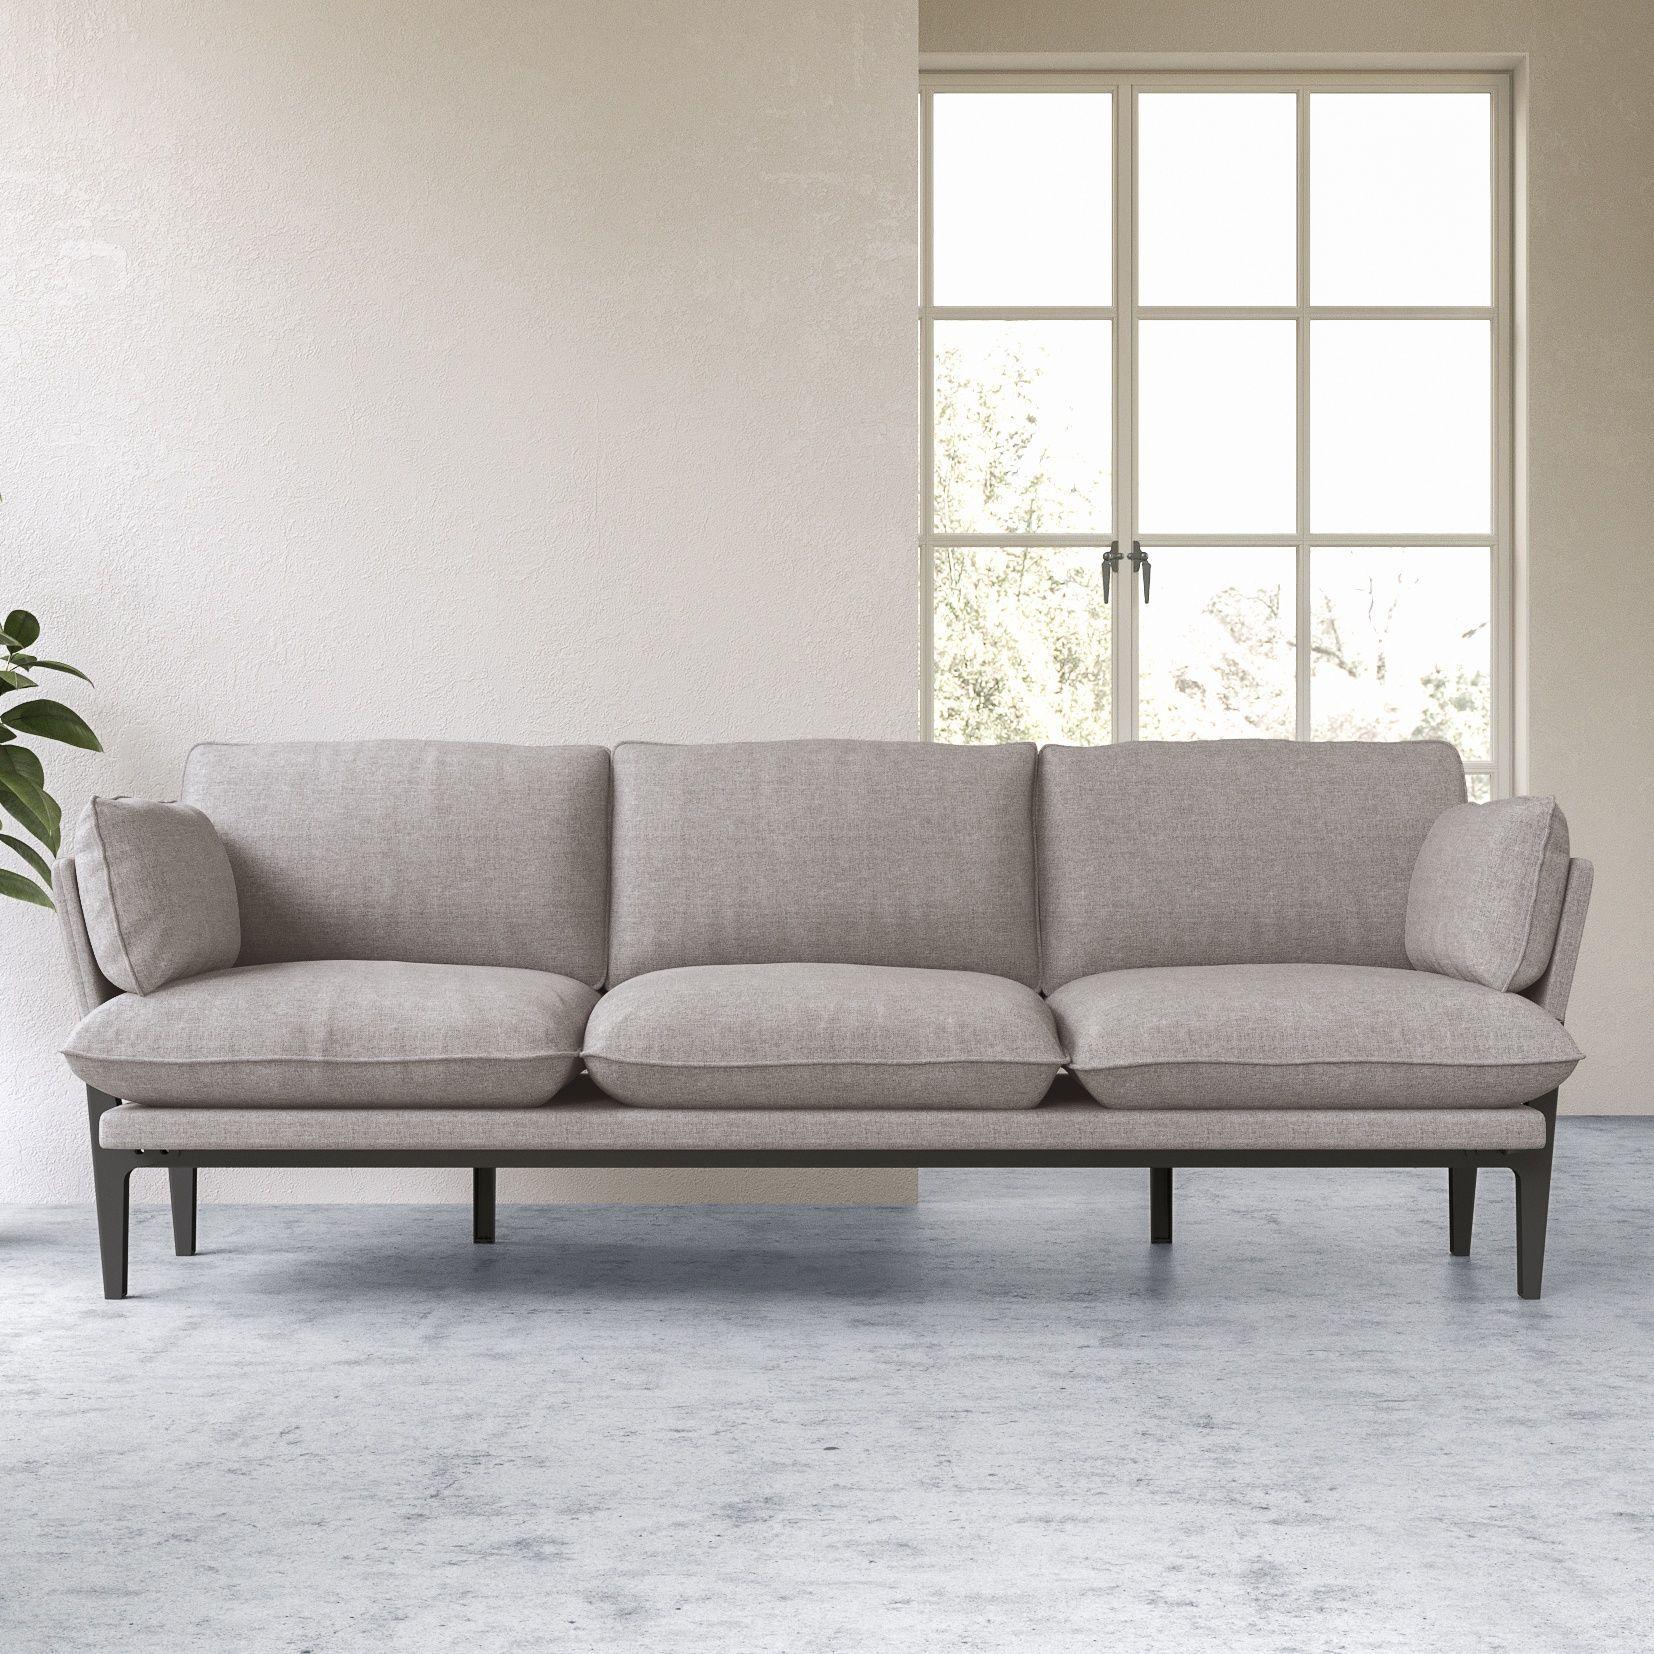 The Floyd Sofa 3 Seater Grey Wood Frame Modern Sofas Mobel Sofa Sofa Design Modernes Sofa